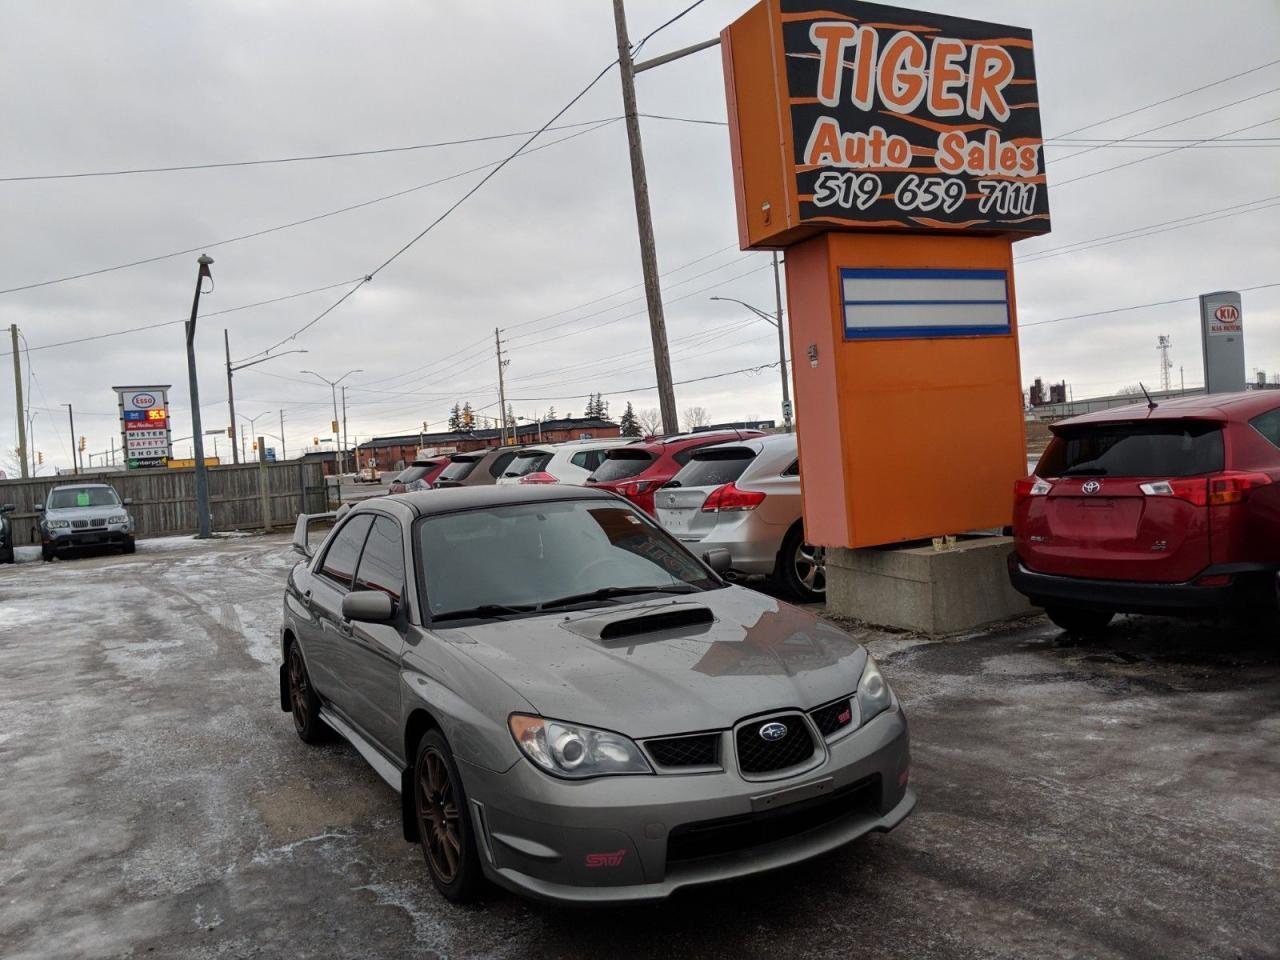 2006 Subaru Impreza WRX STi TURBO**RARE**NO ACCIDENTS**ONLY 160KMS**